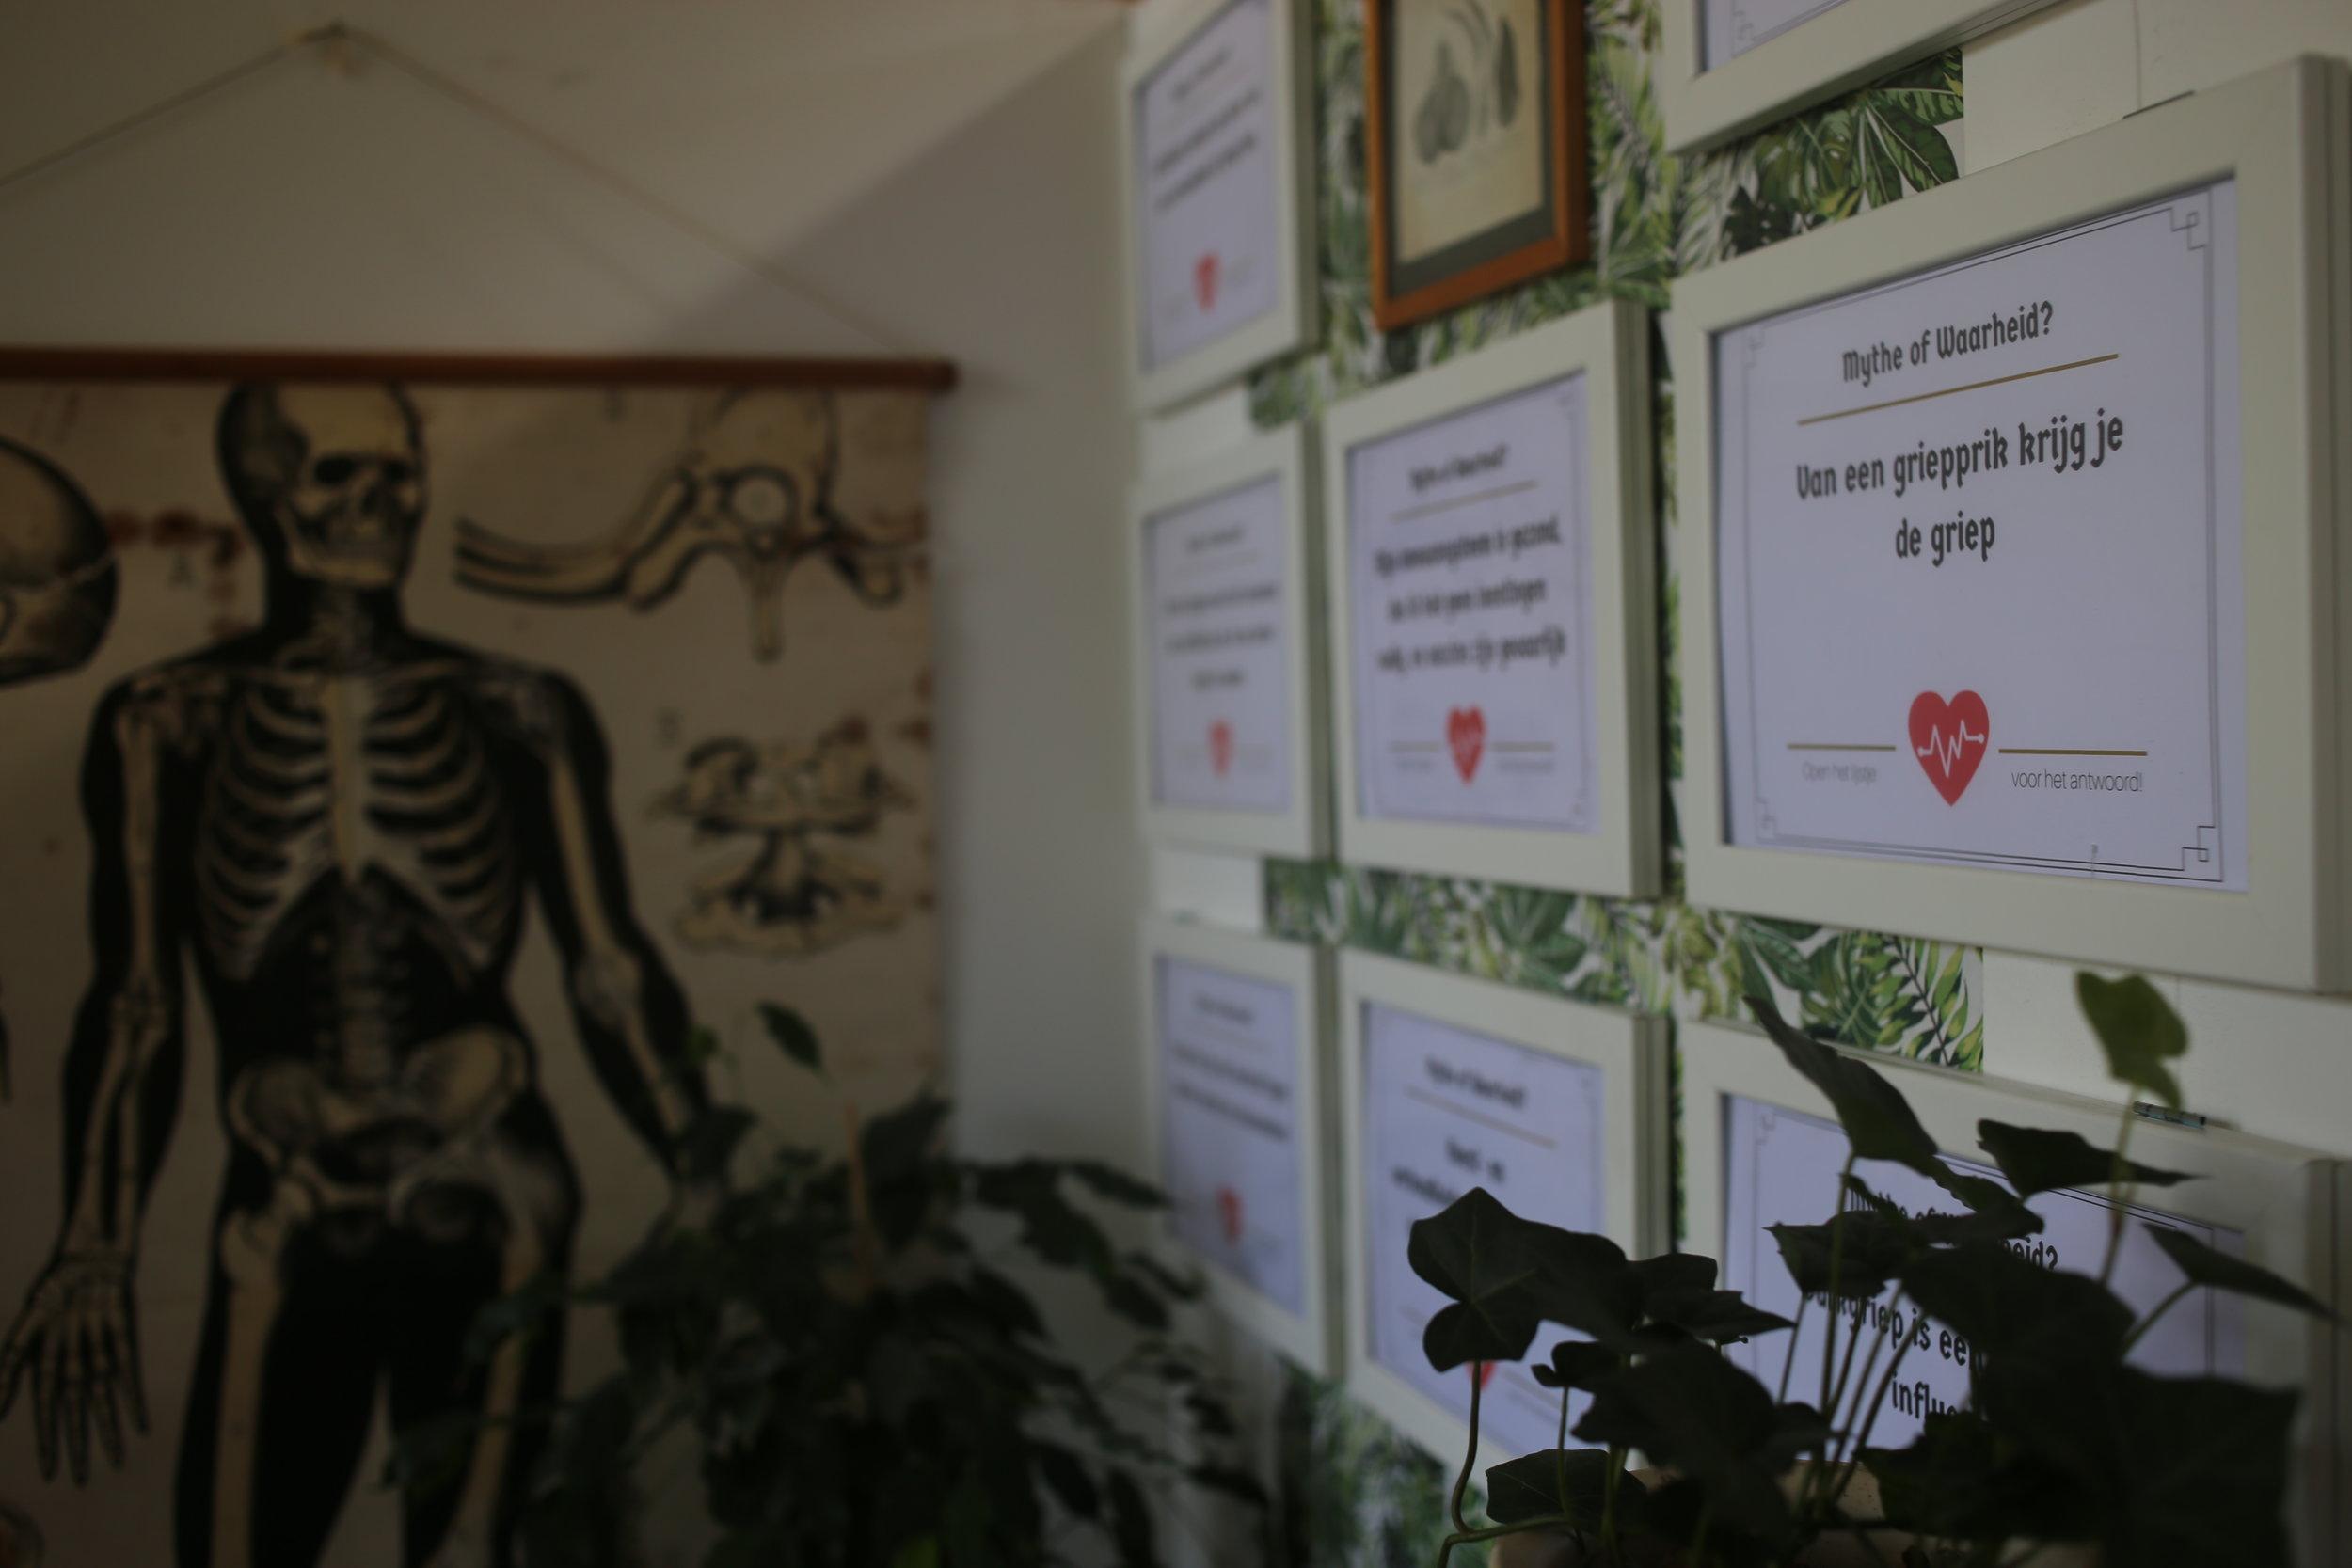 Labyrint der Infectieziekten - UMC Utrecht